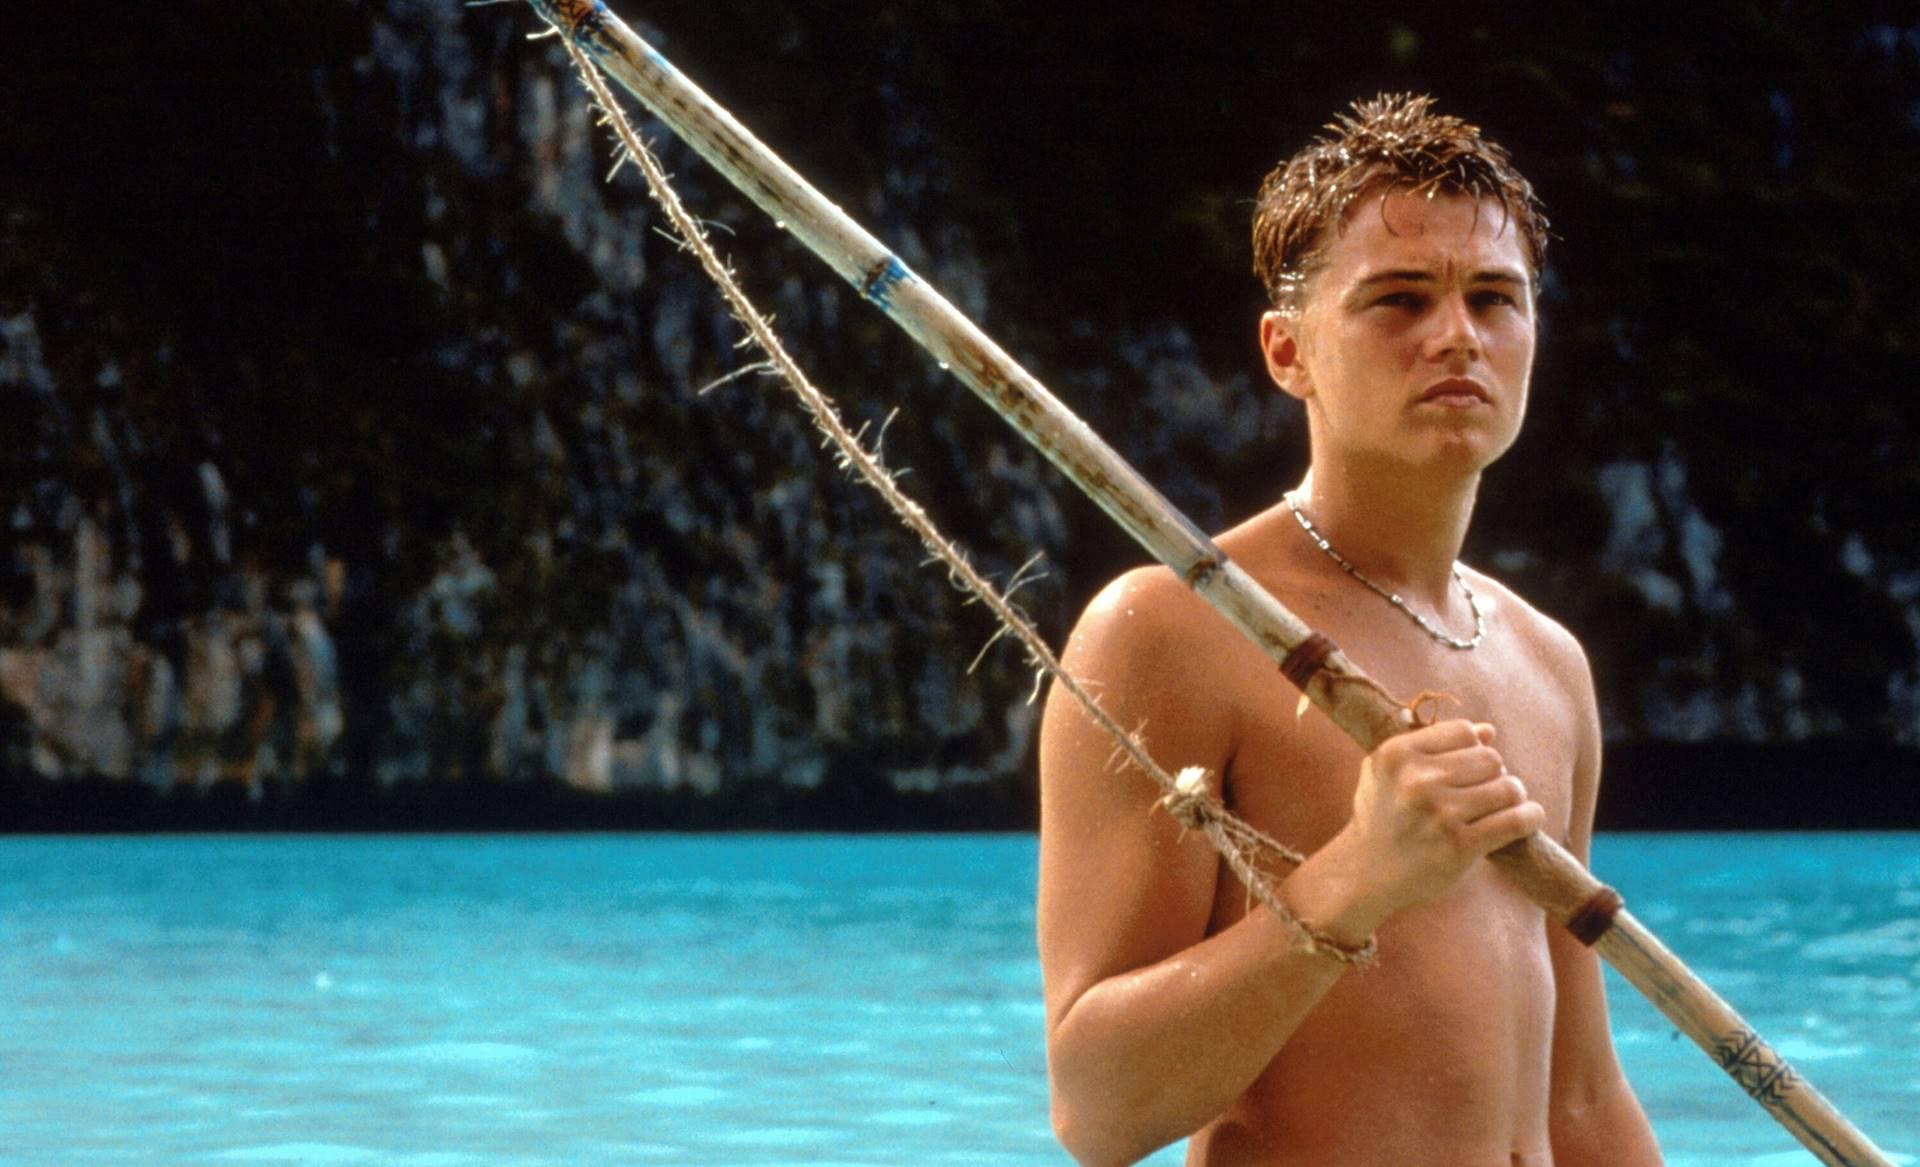 La playa. The Beach (2000) Directed by Danny Boyle Shown: Leonardo DiCaprio (as Richard)